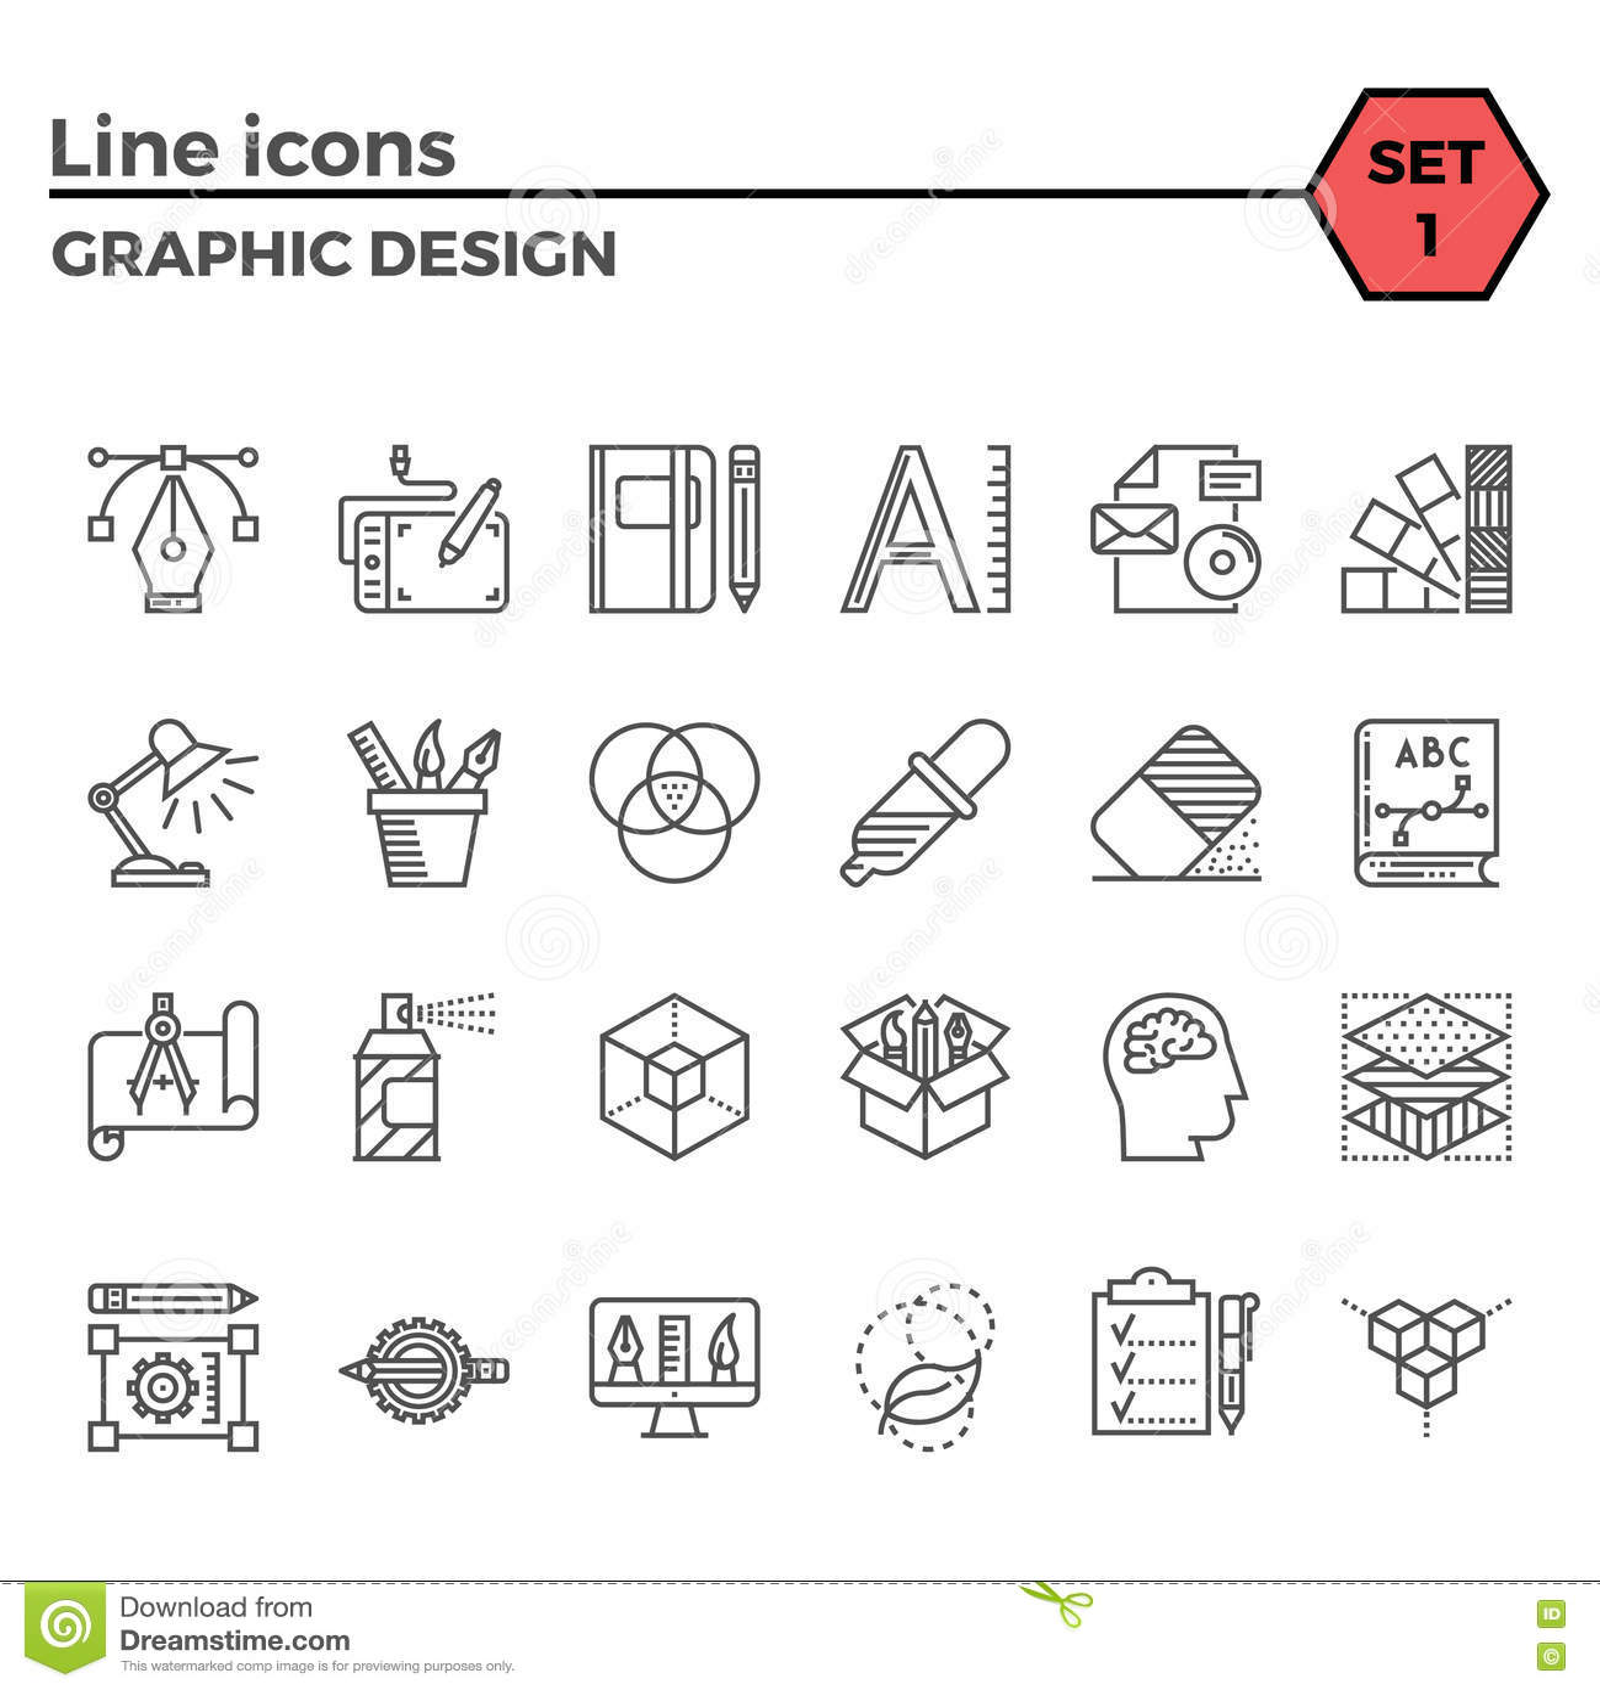 Line Graphic Design : Graphic design thin line icons set stock vector image